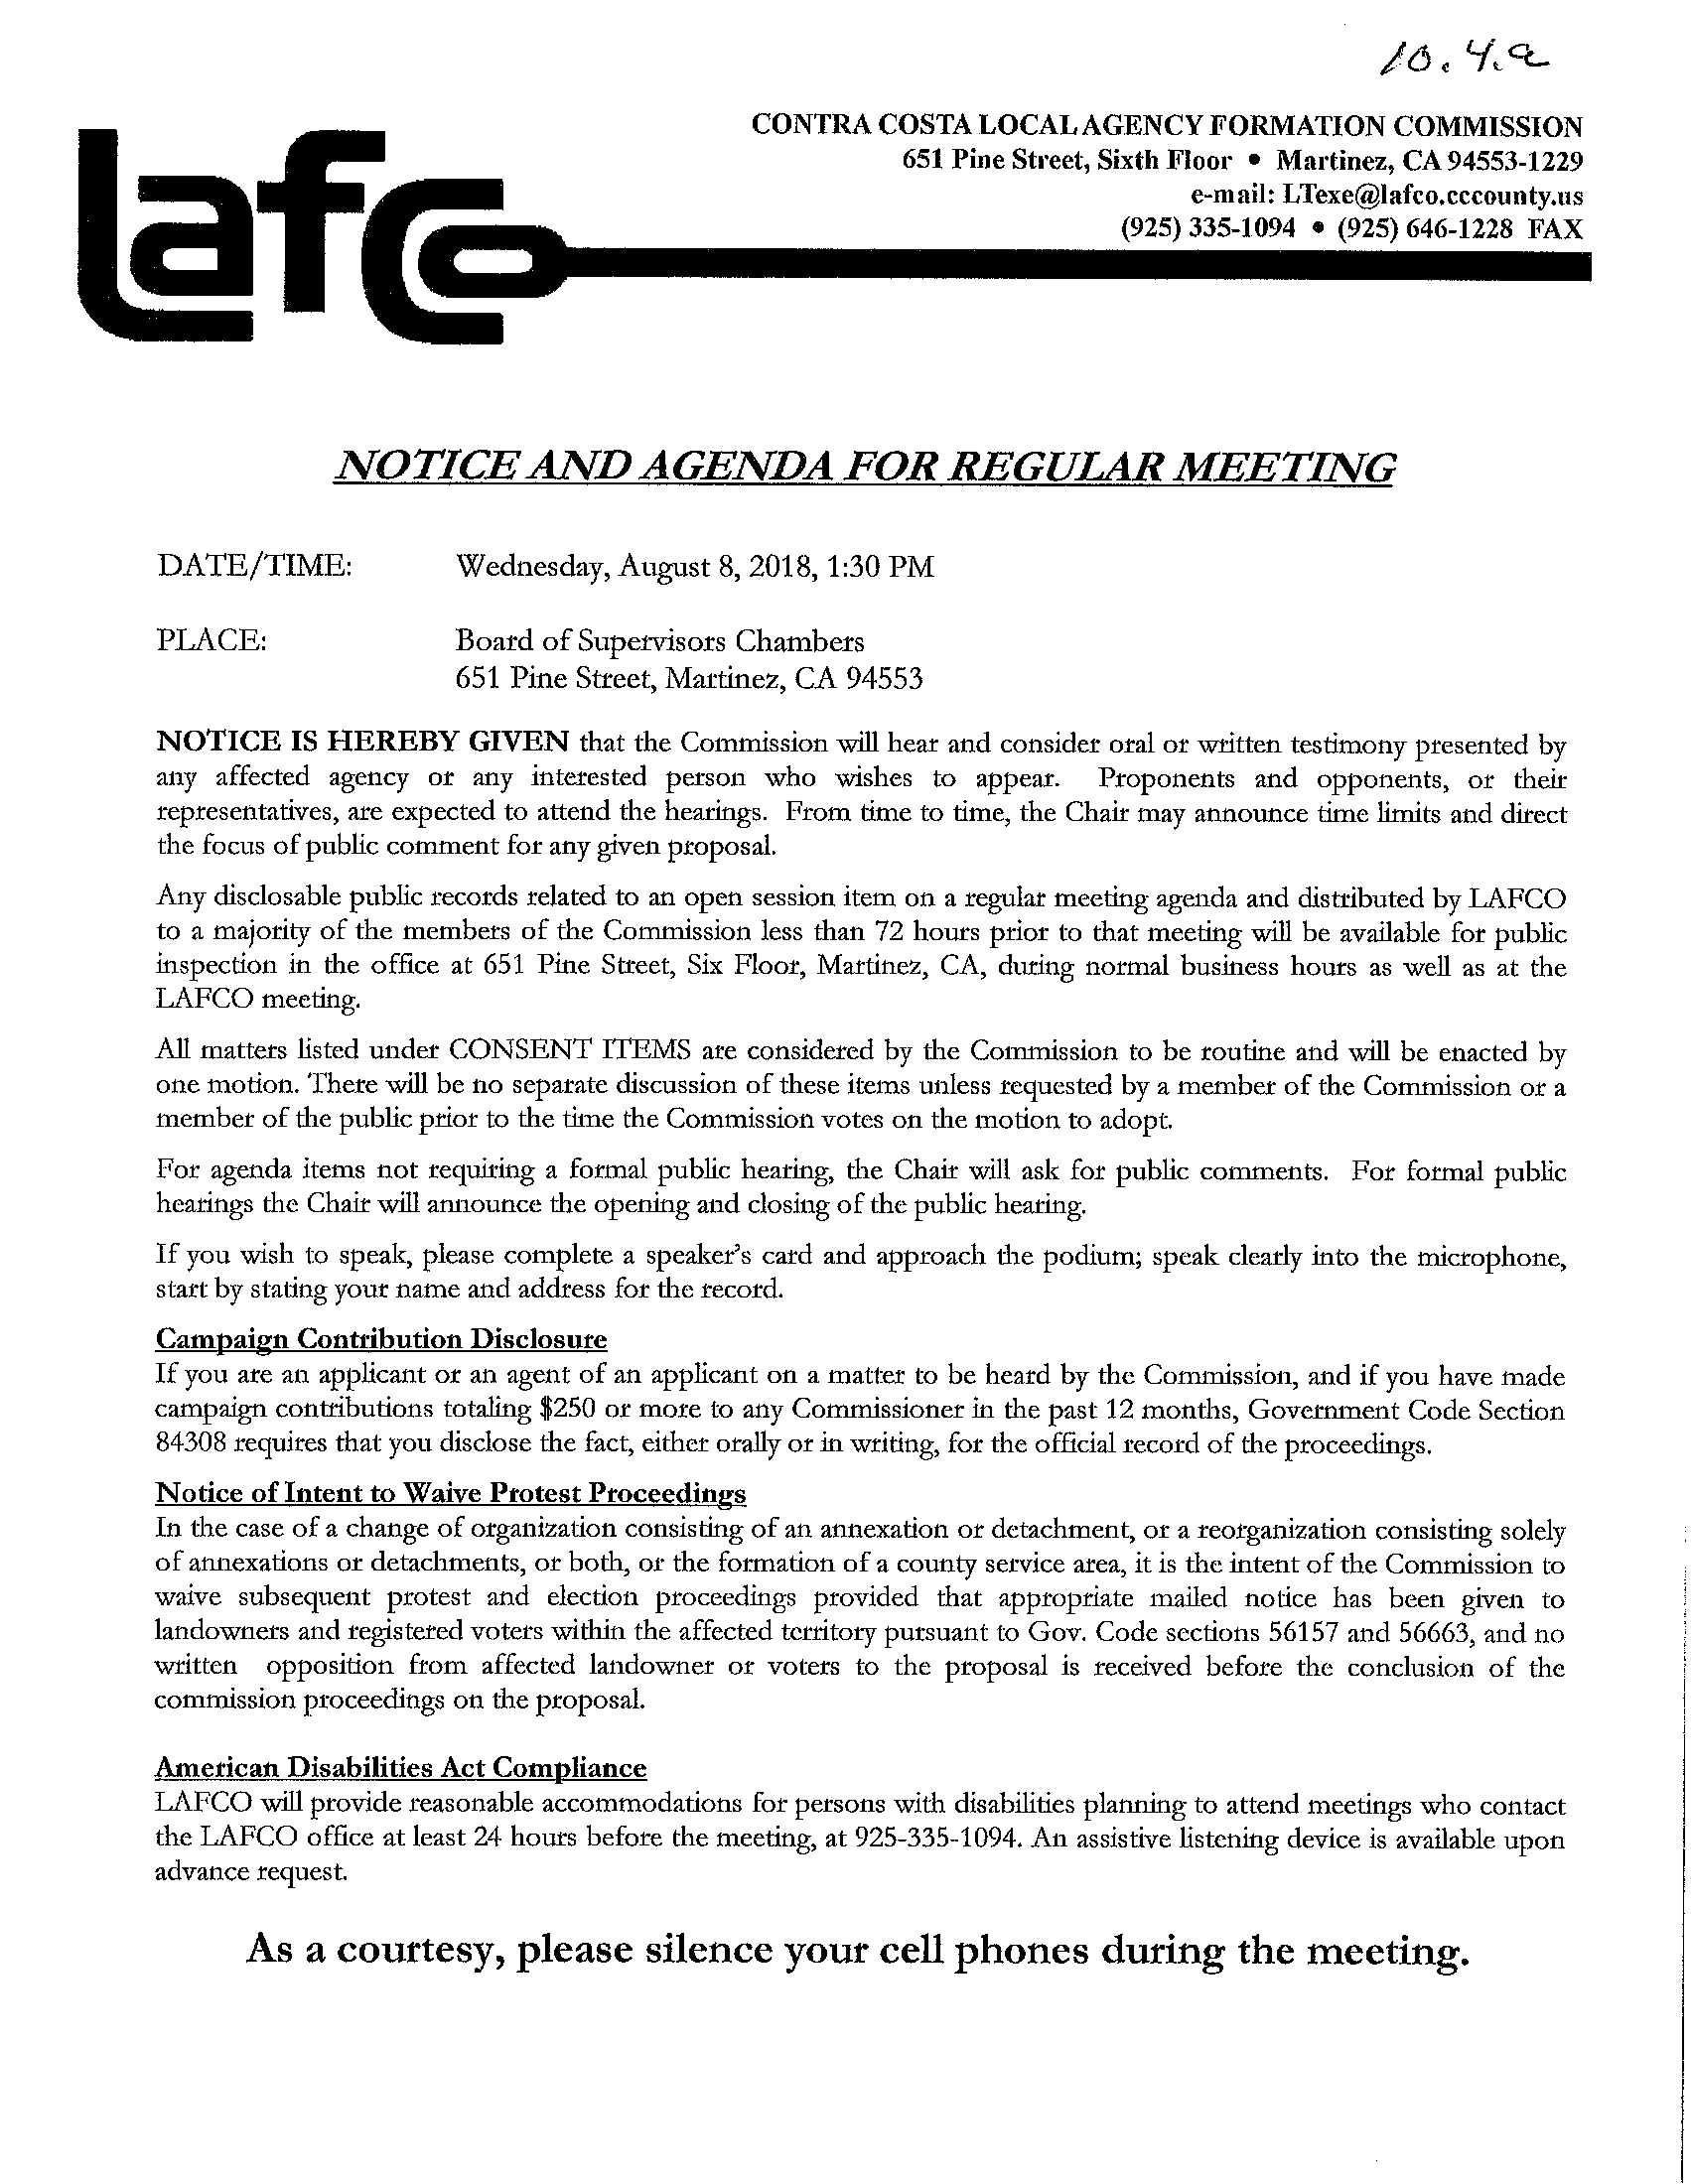 ESMAC Agenda 09.12.2018 (22 Pages)_15.jpg